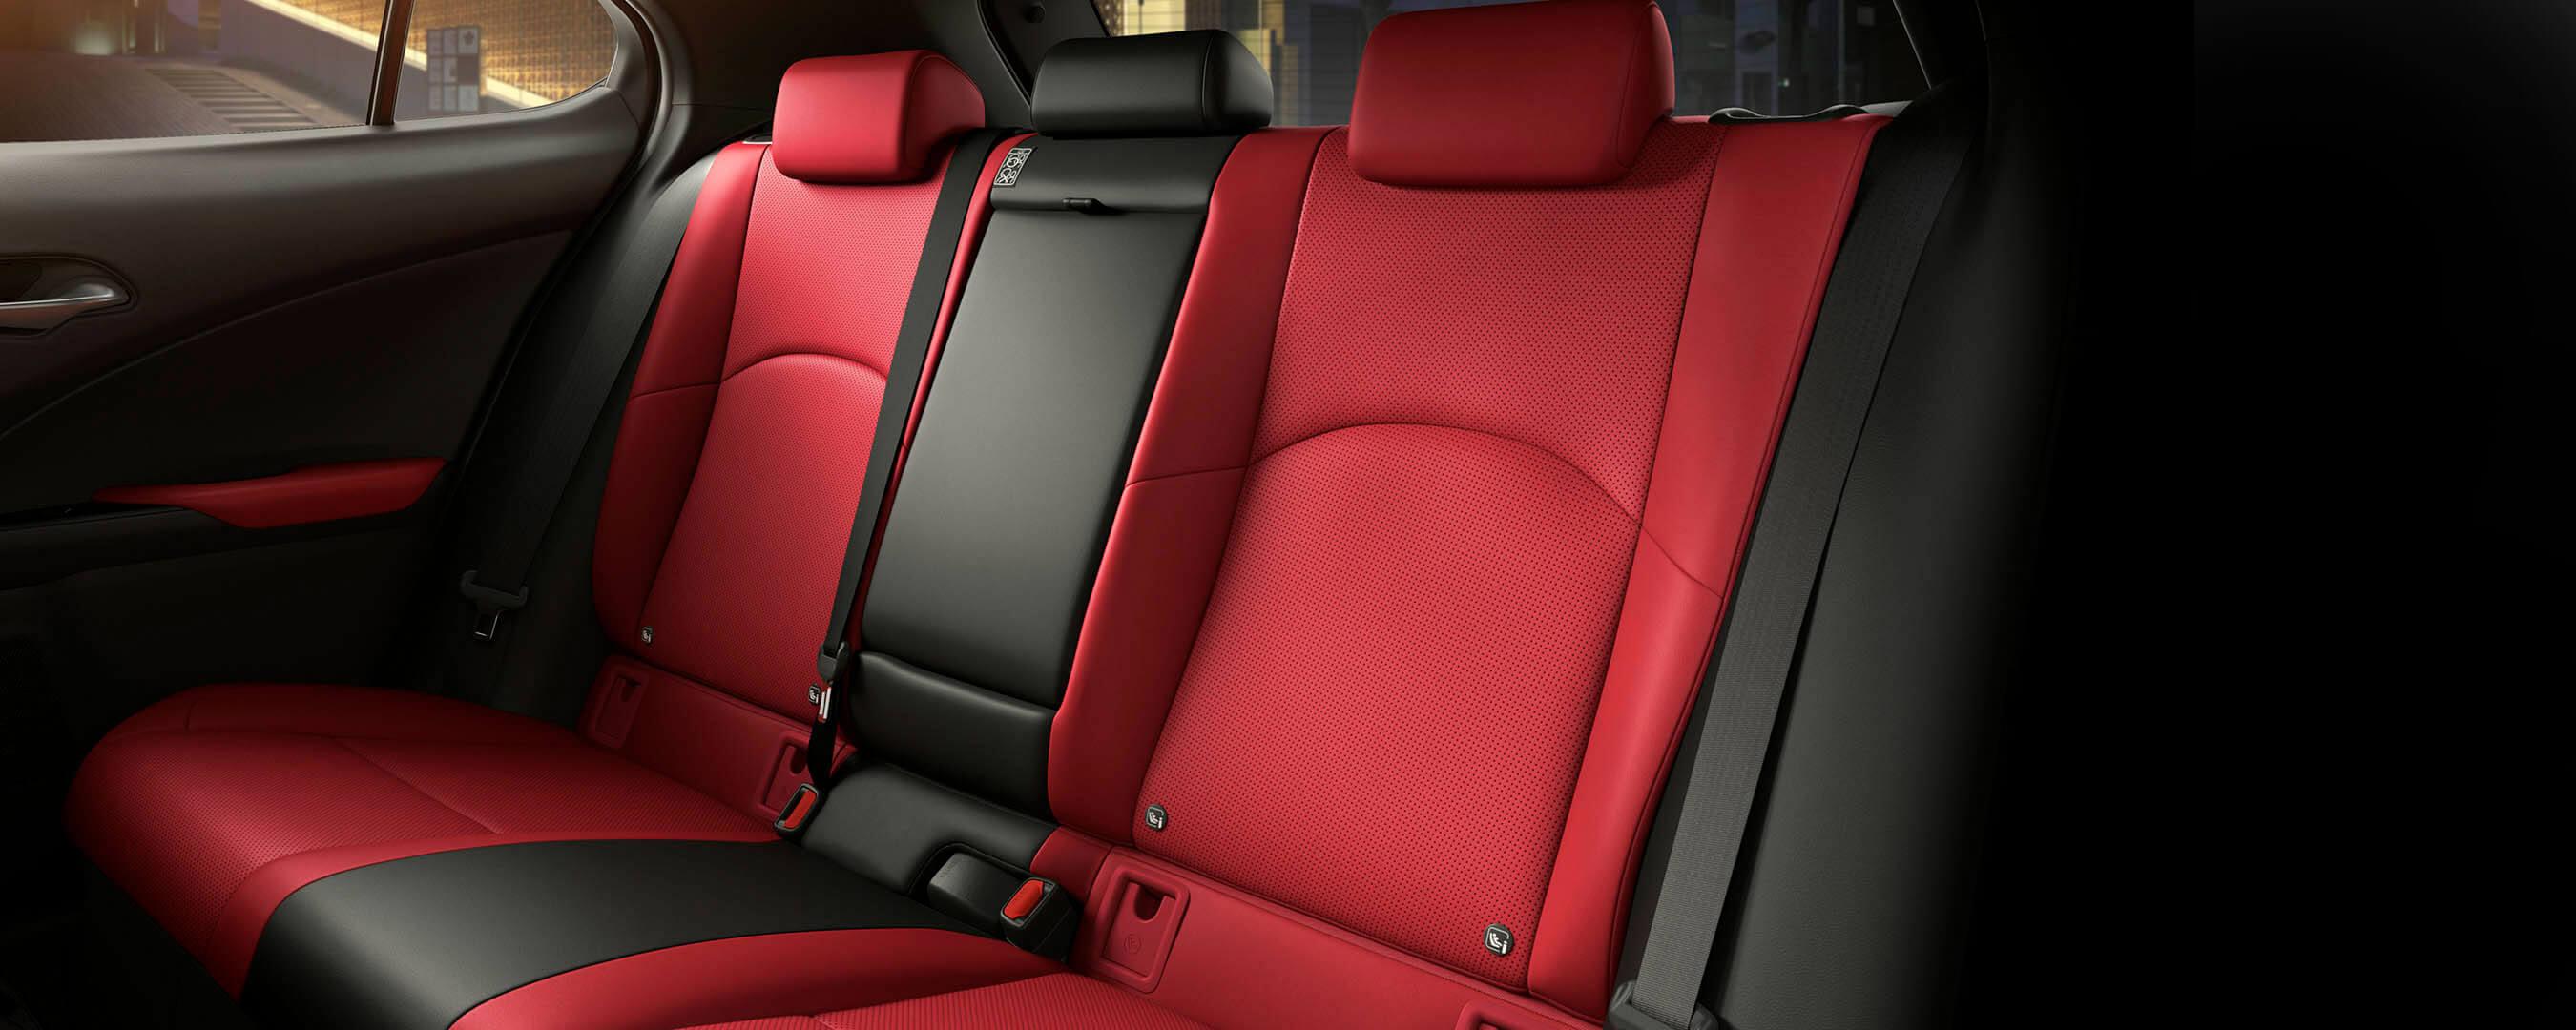 Lexus UX rote Rücksitze